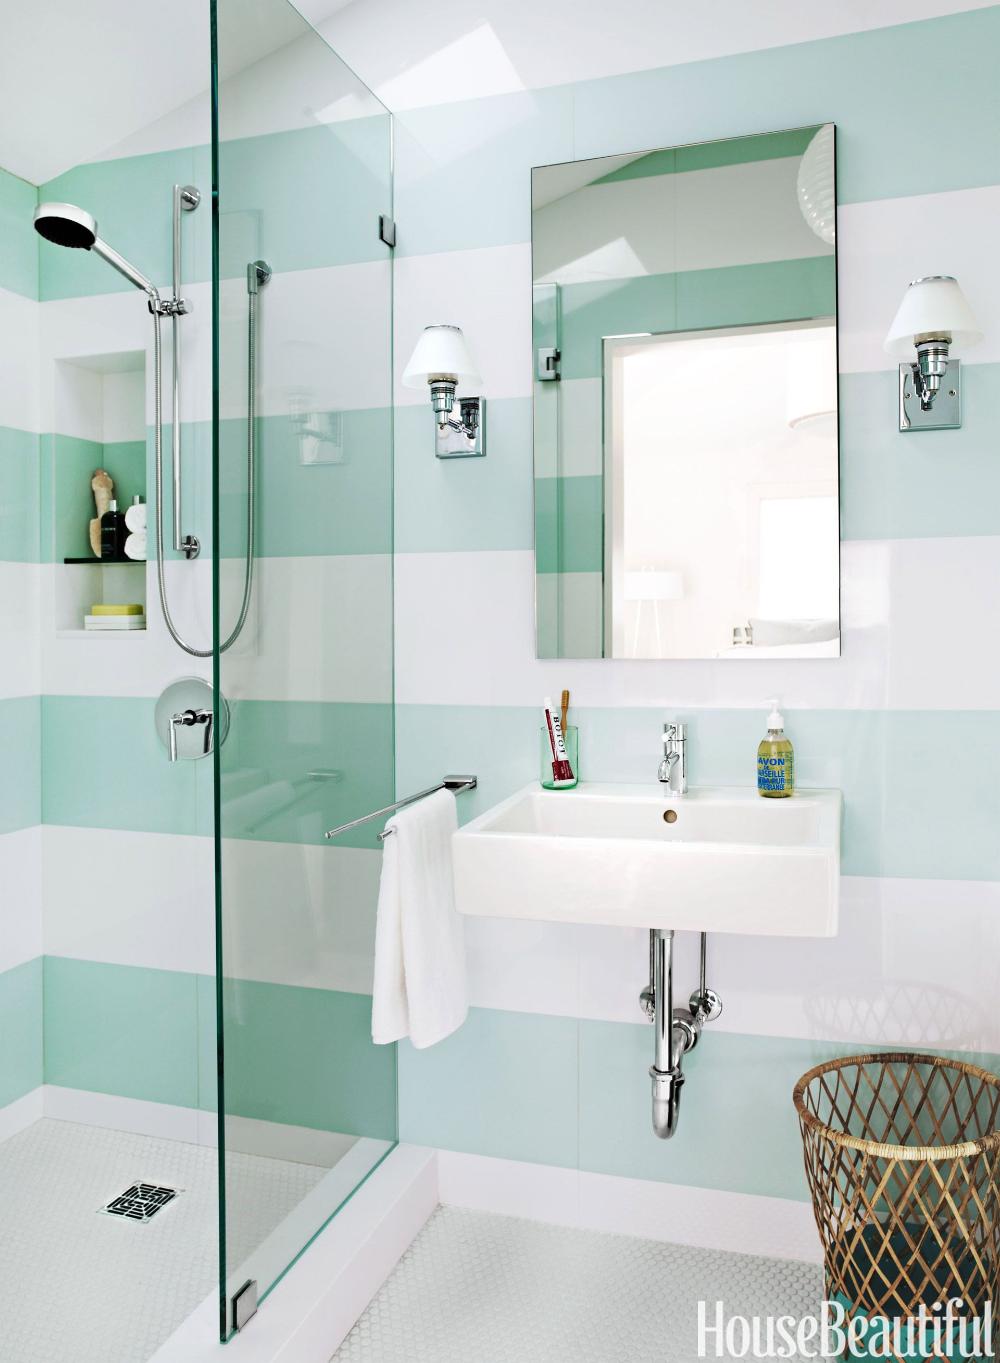 Bathroom Color Scheme Awesome 18 Best Bathroom Colors Top Paint Colors For Bathroom Walls Ide Kamar Mandi Desain Desain Interior